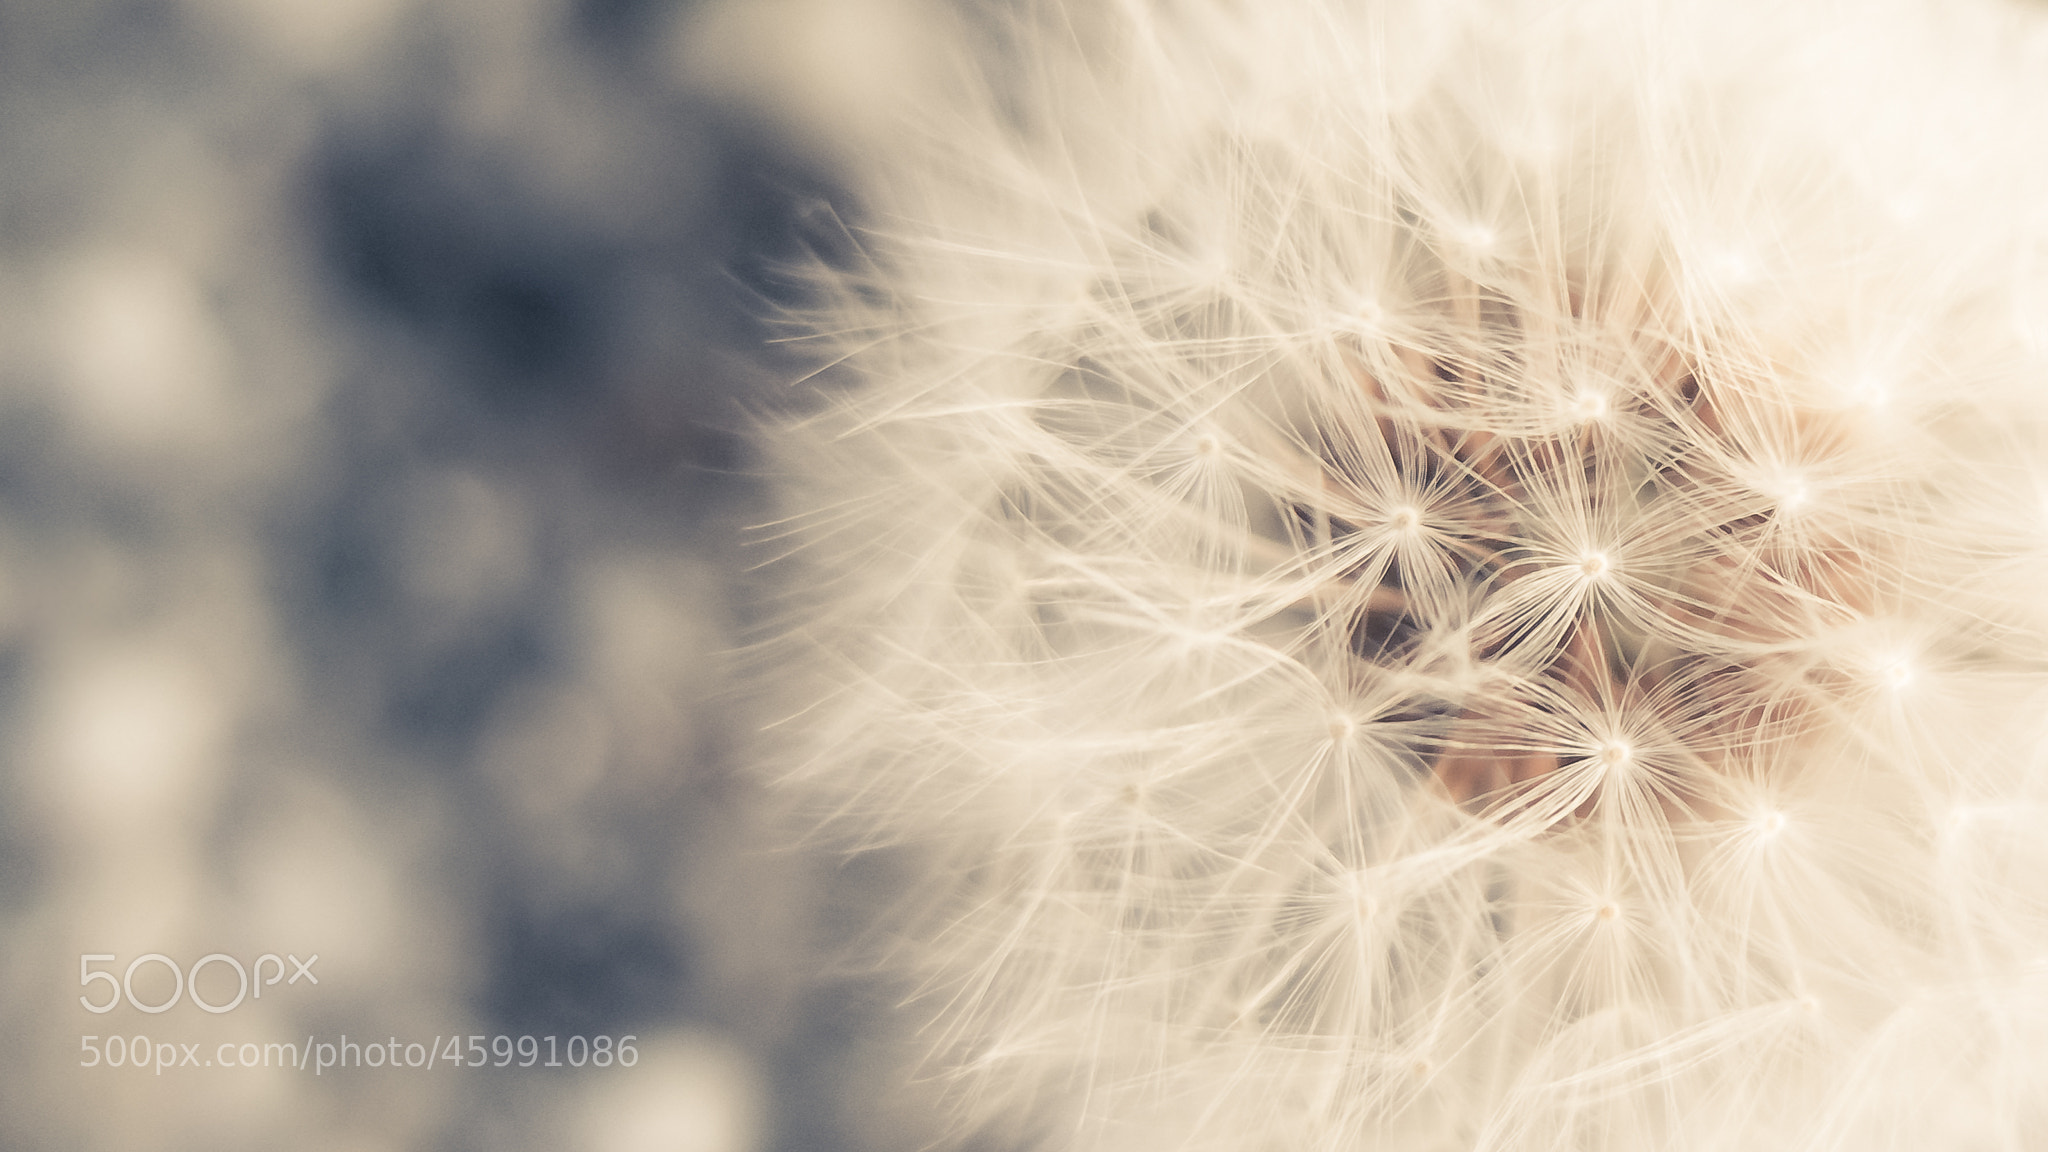 Photograph Soft Dandelion by Ninnie B on 500px